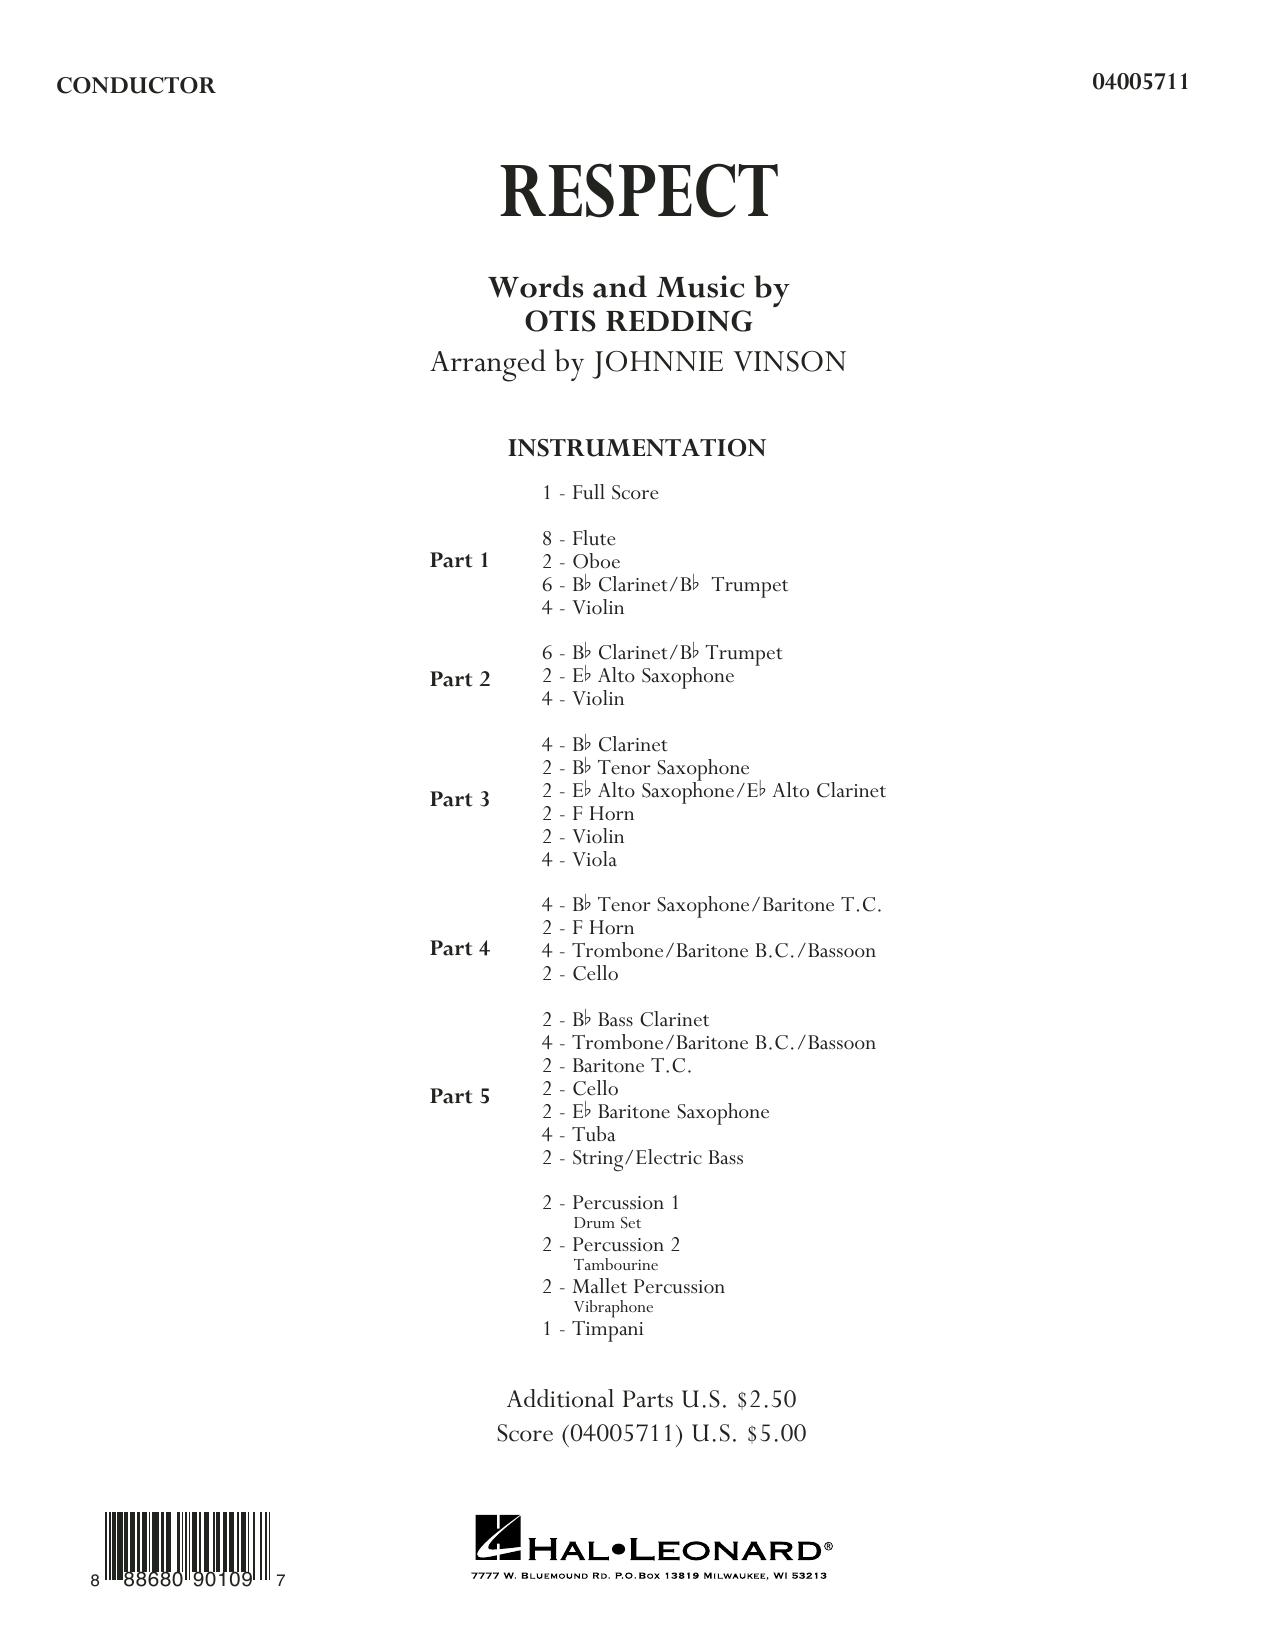 Respect (arr. Johnnie Vinson) - Conductor Score (Full Score) (Concert Band: Flex-Band)